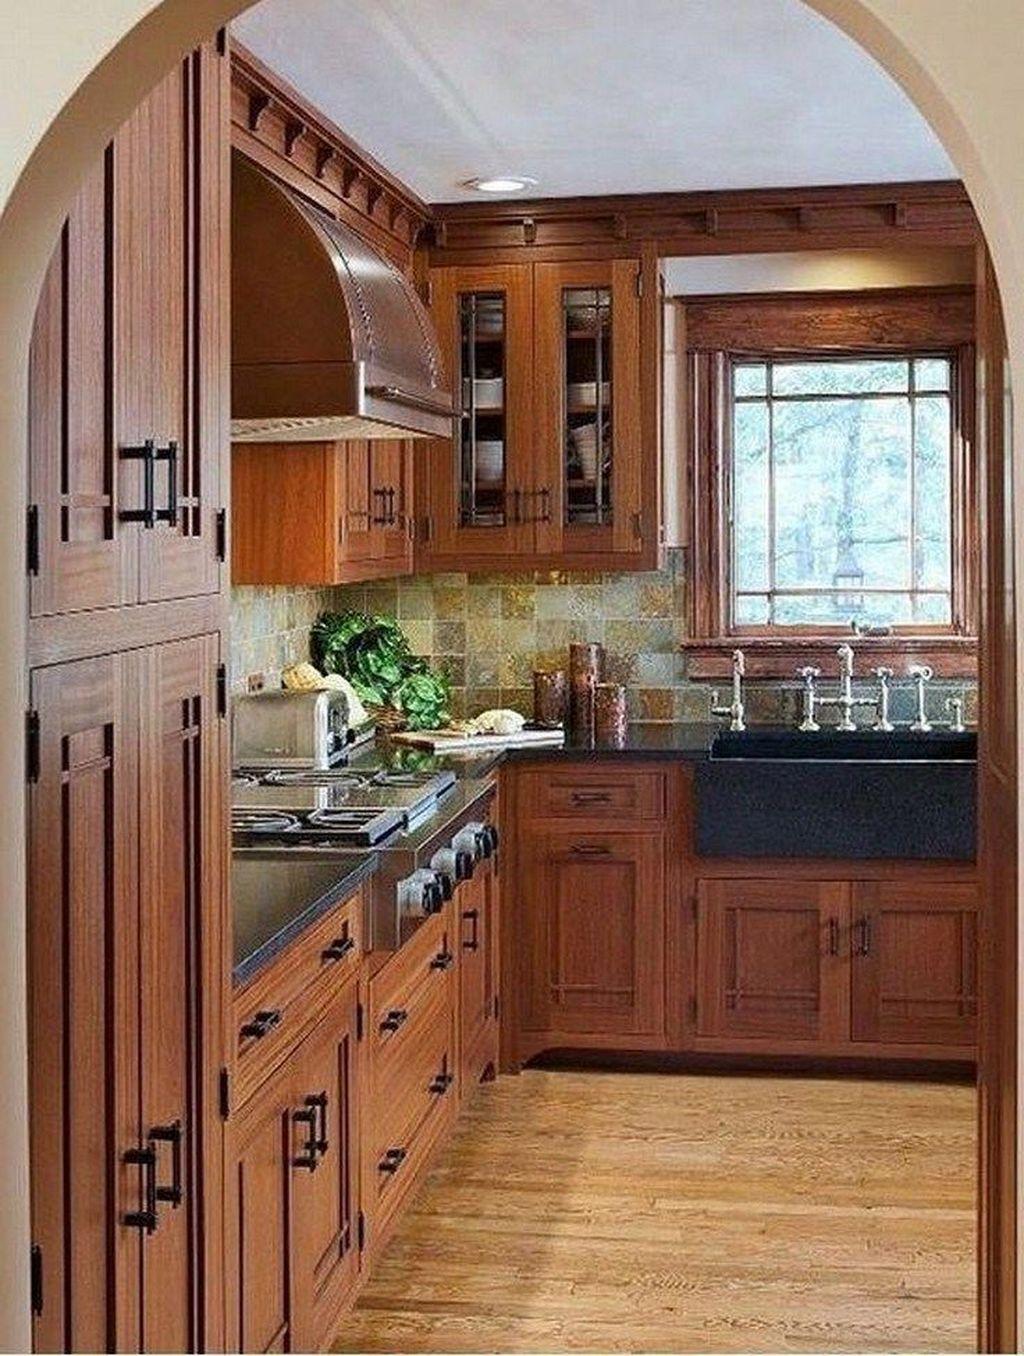 Fabulous Modern Rustic Kitchen Cabinets 21 - MAGZHOUSE